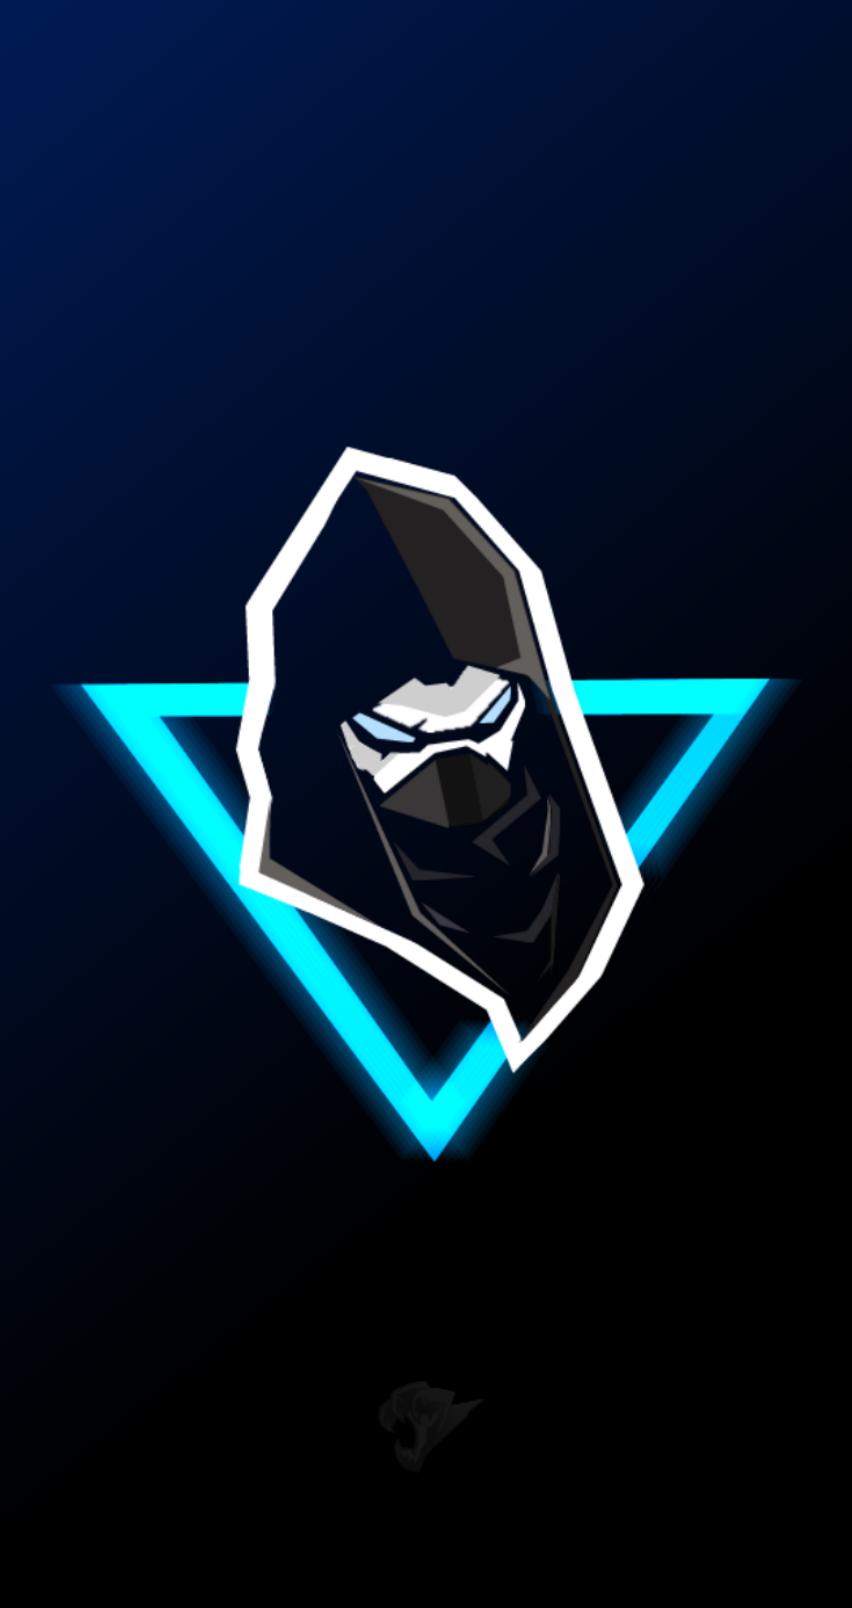 Enforcer mascot logo, wallpaper fortnite Fundos para